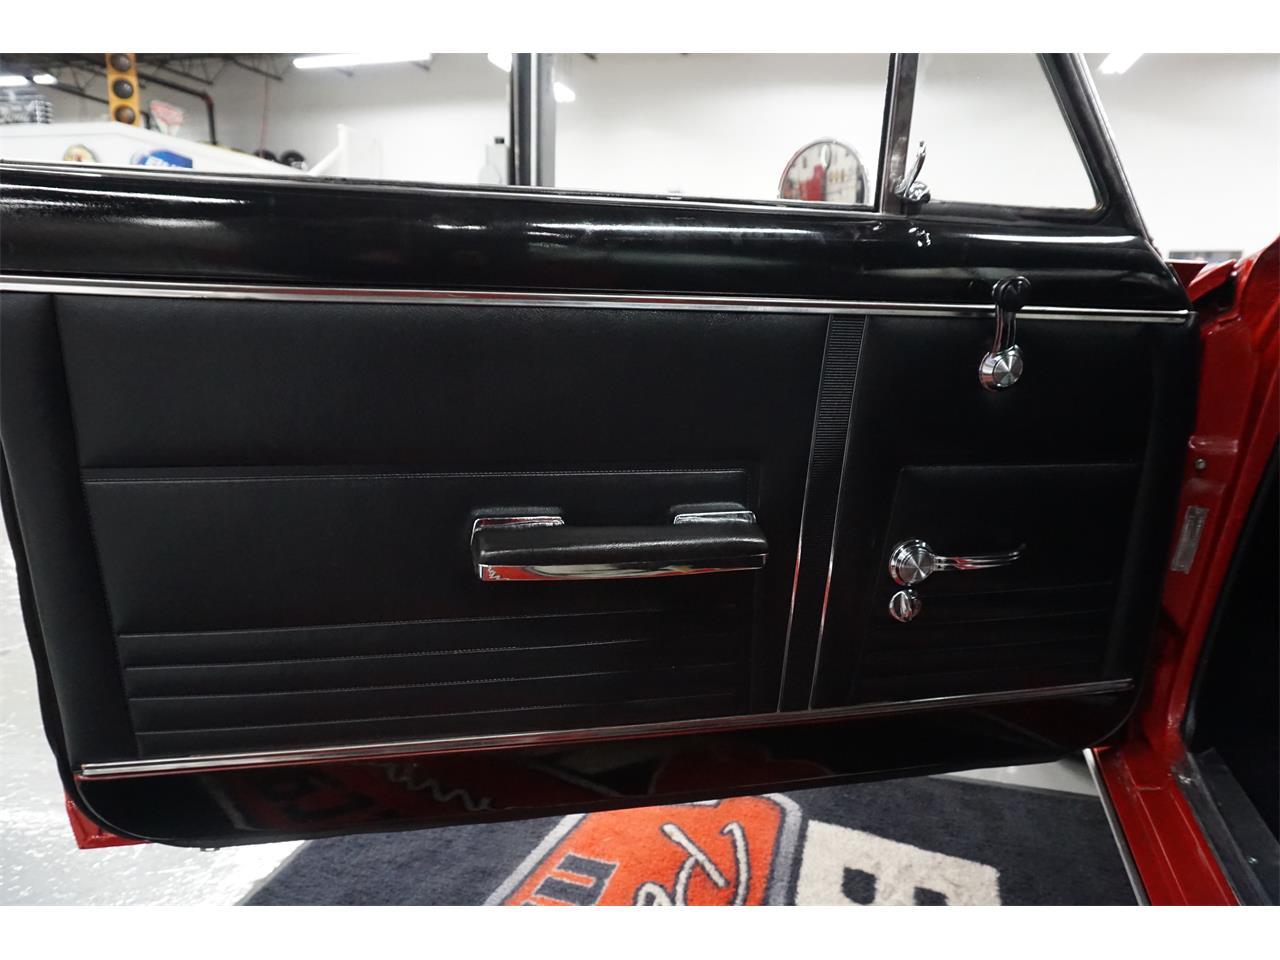 1967 Chevrolet Nova (CC-1194180) for sale in Glen Burnie, Maryland